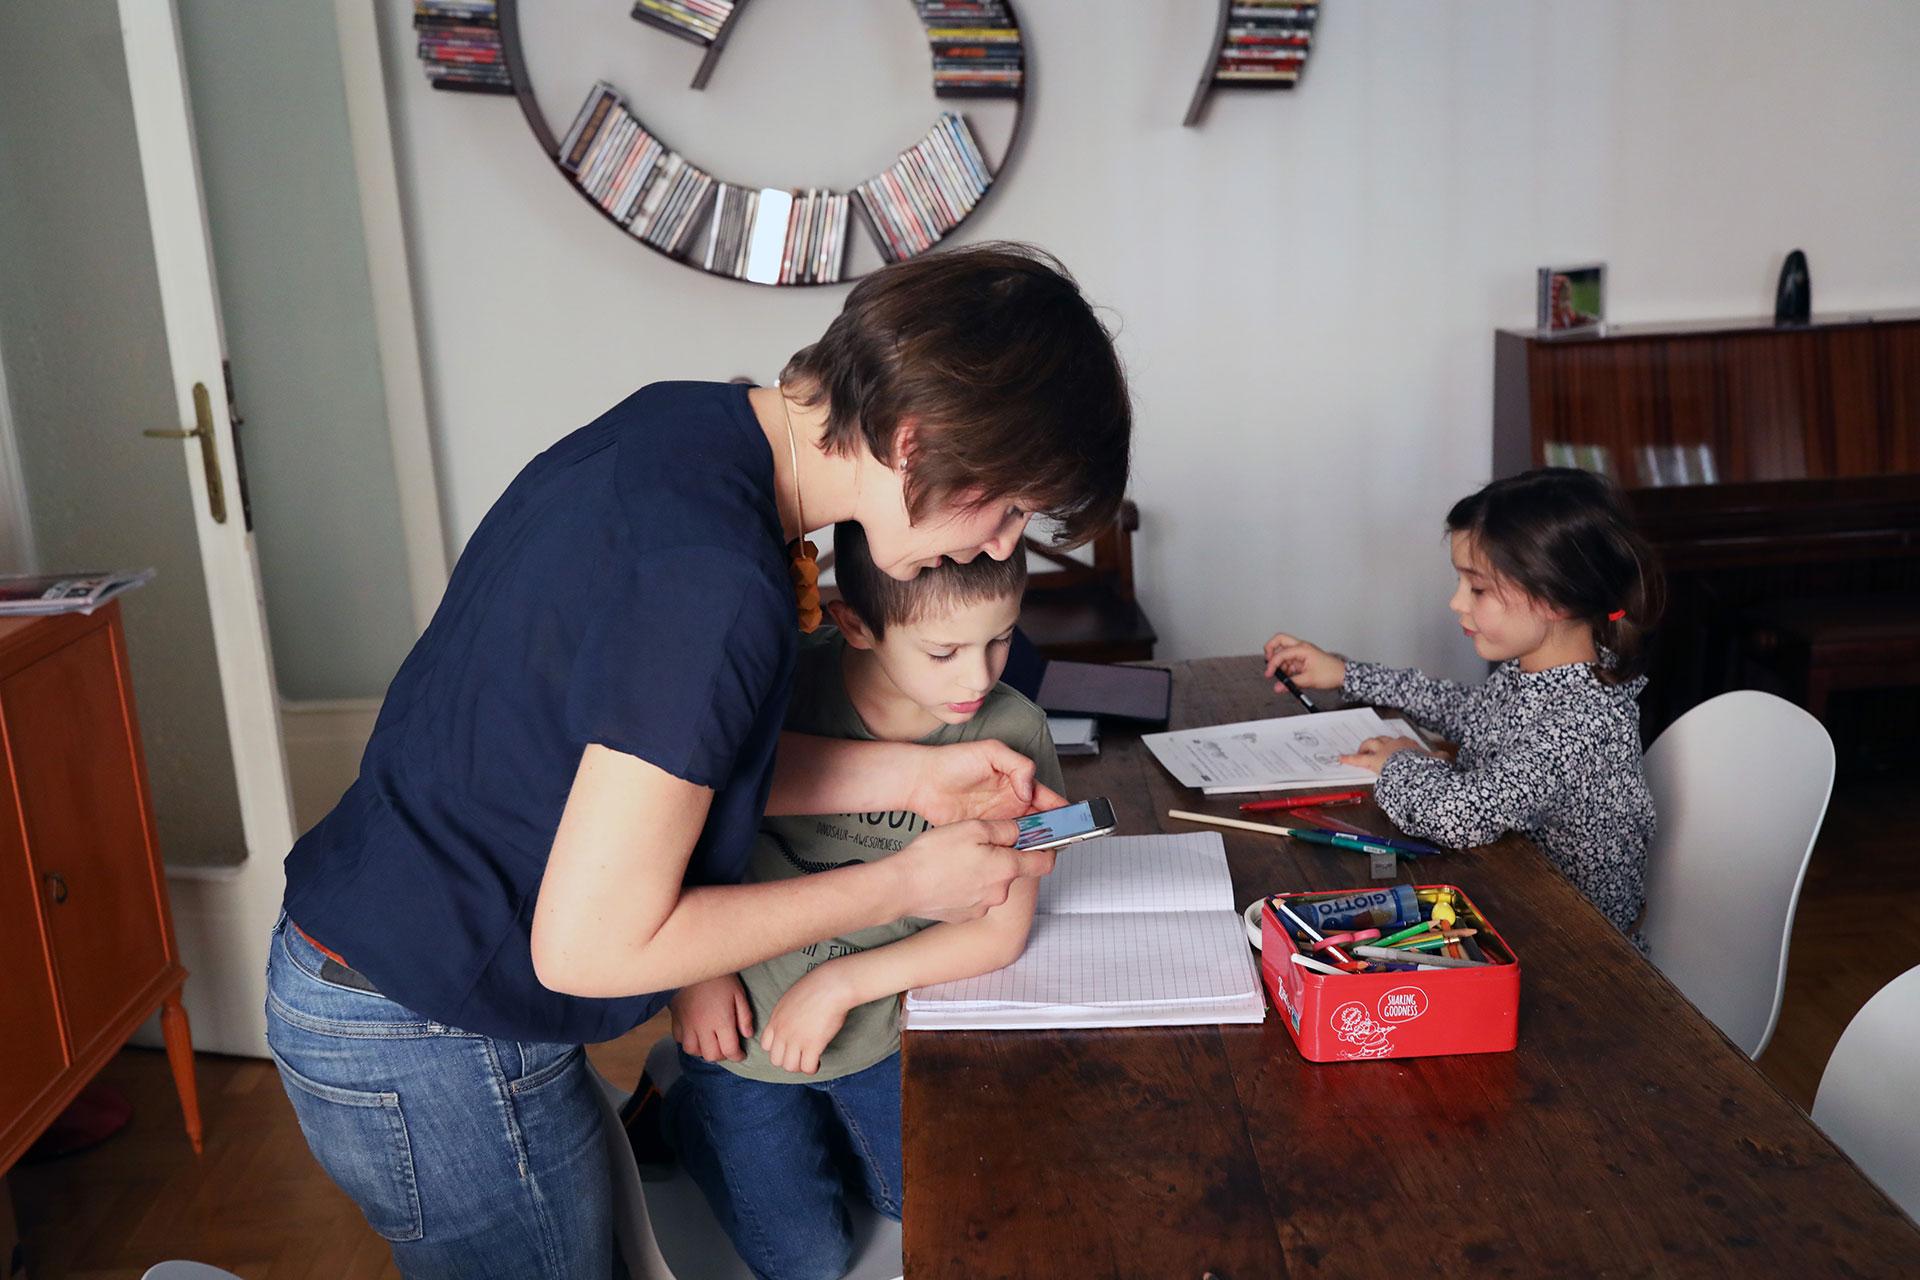 report Save the children sulle mamme in Italia